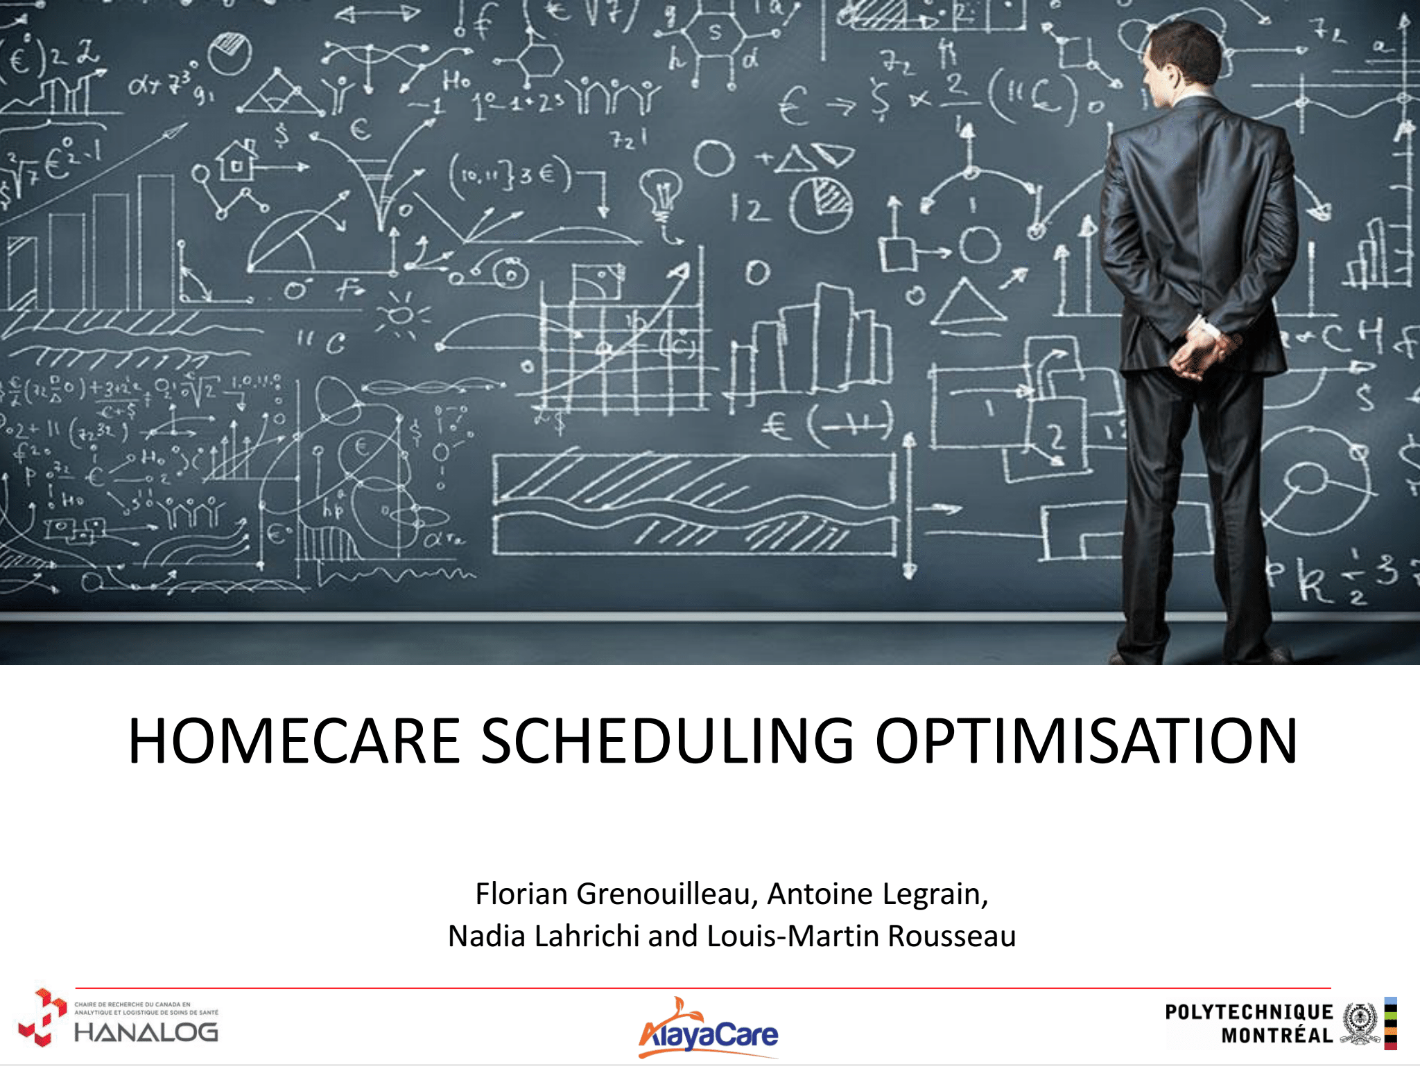 homecare-scheduling-optimization